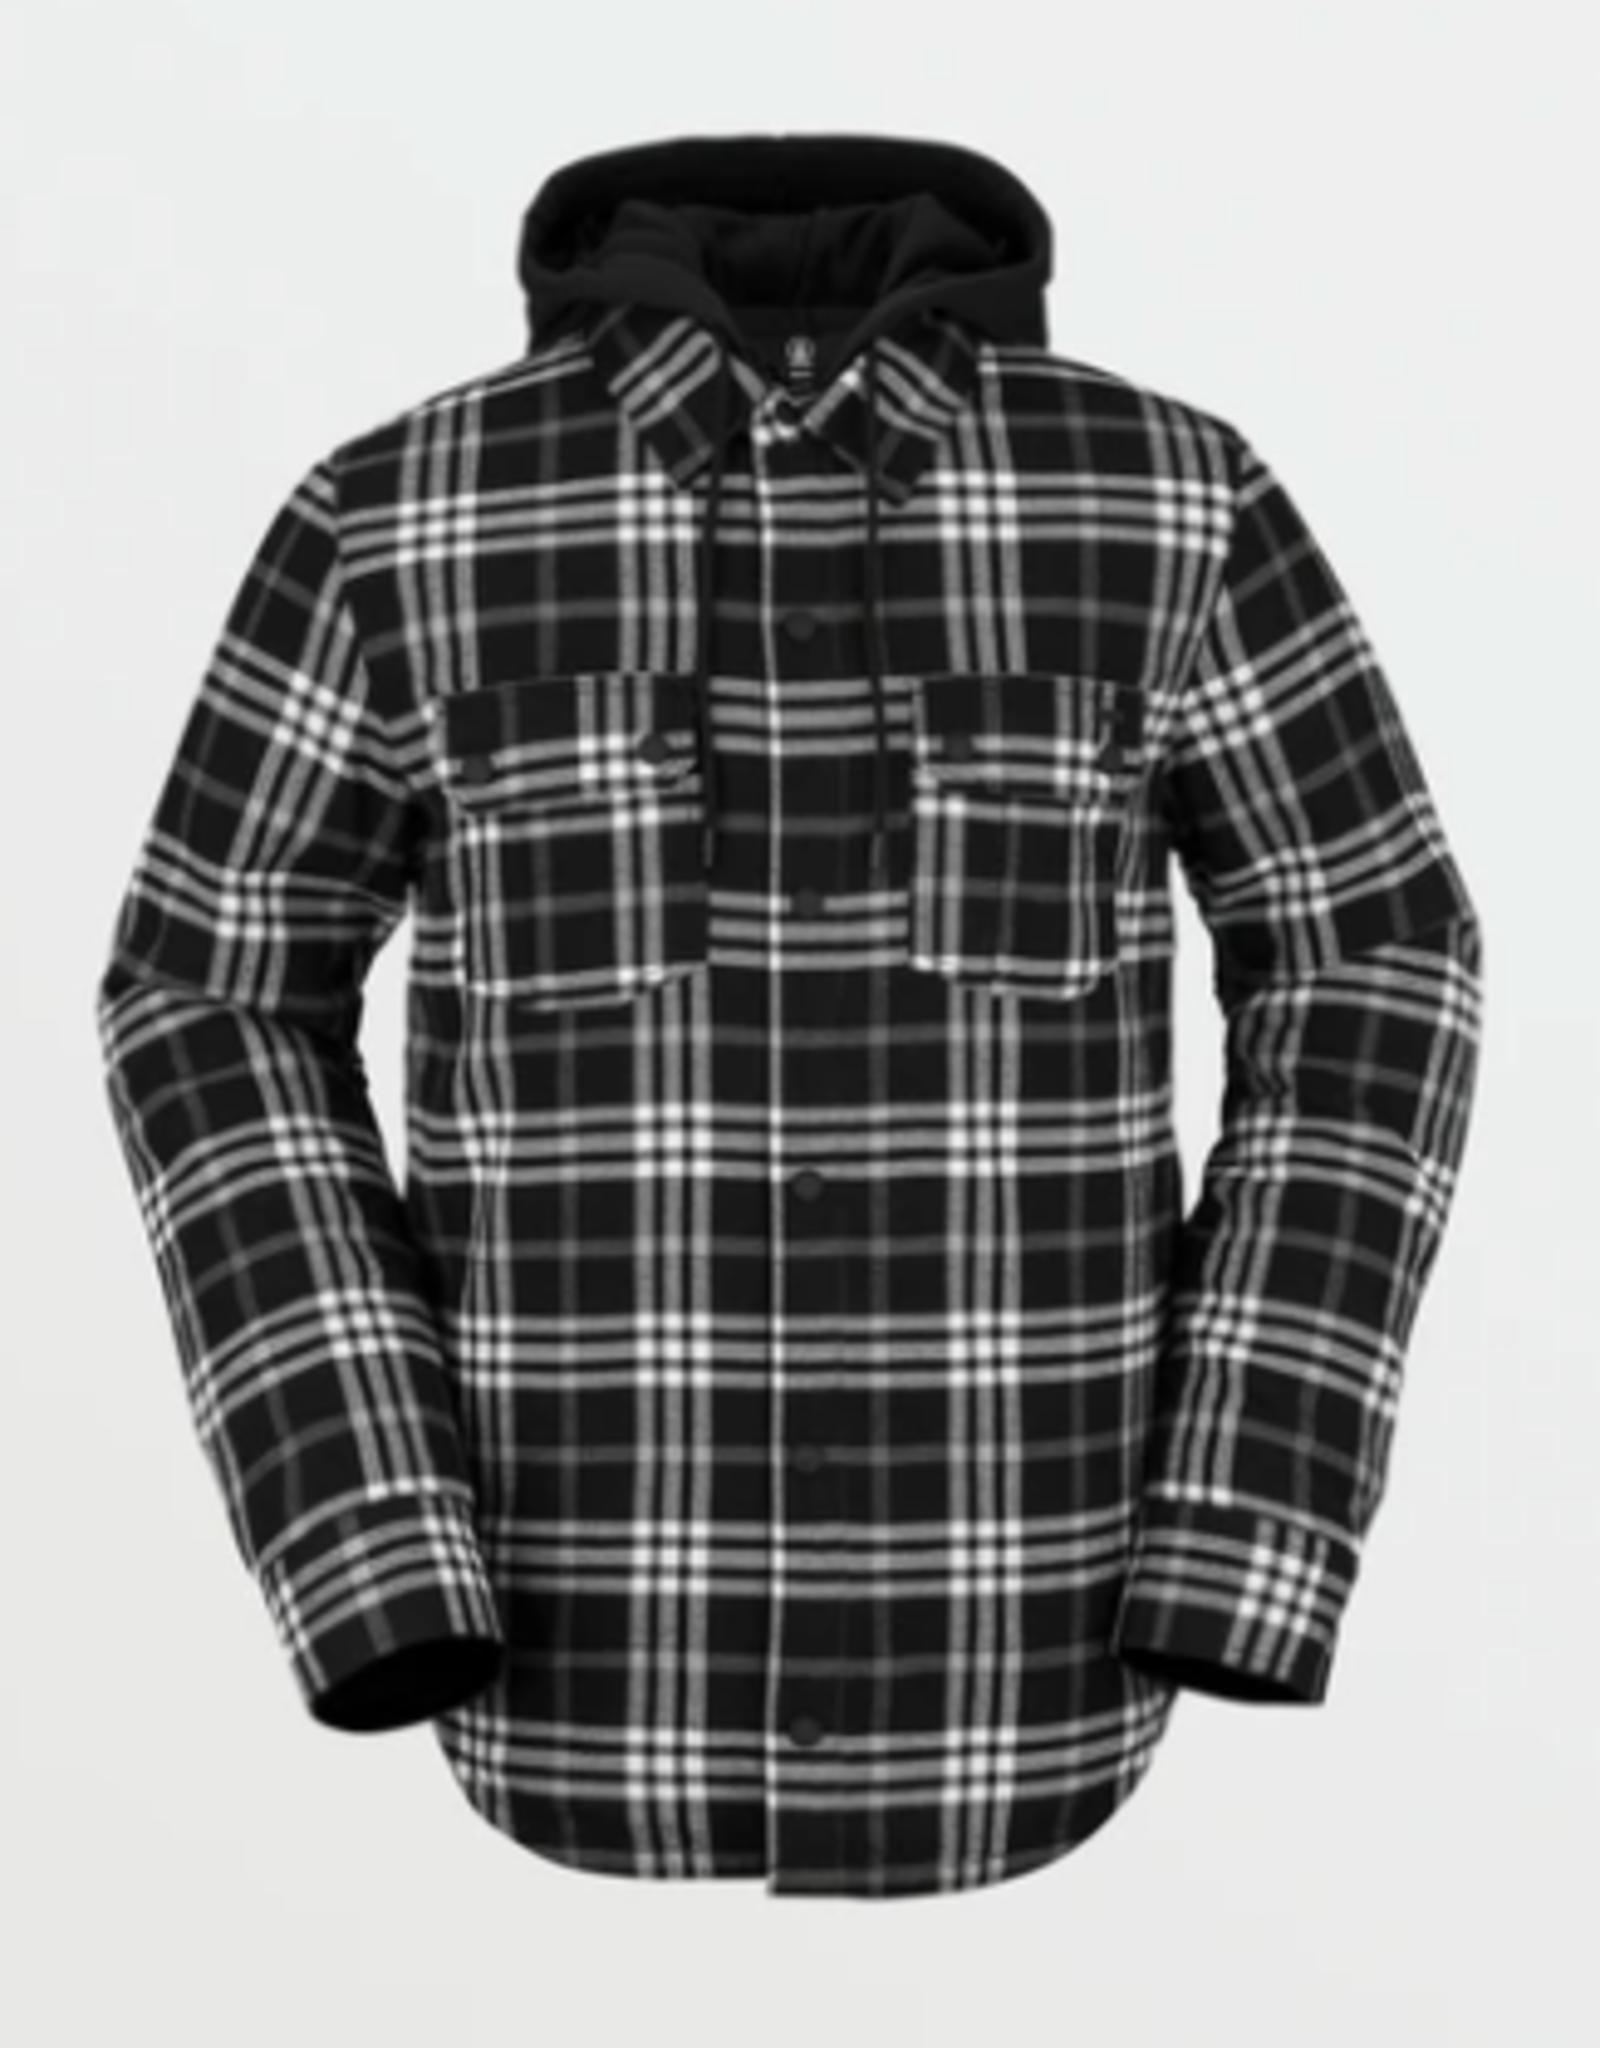 Volcom Men's Field Insulated Flannel Jacket BLK